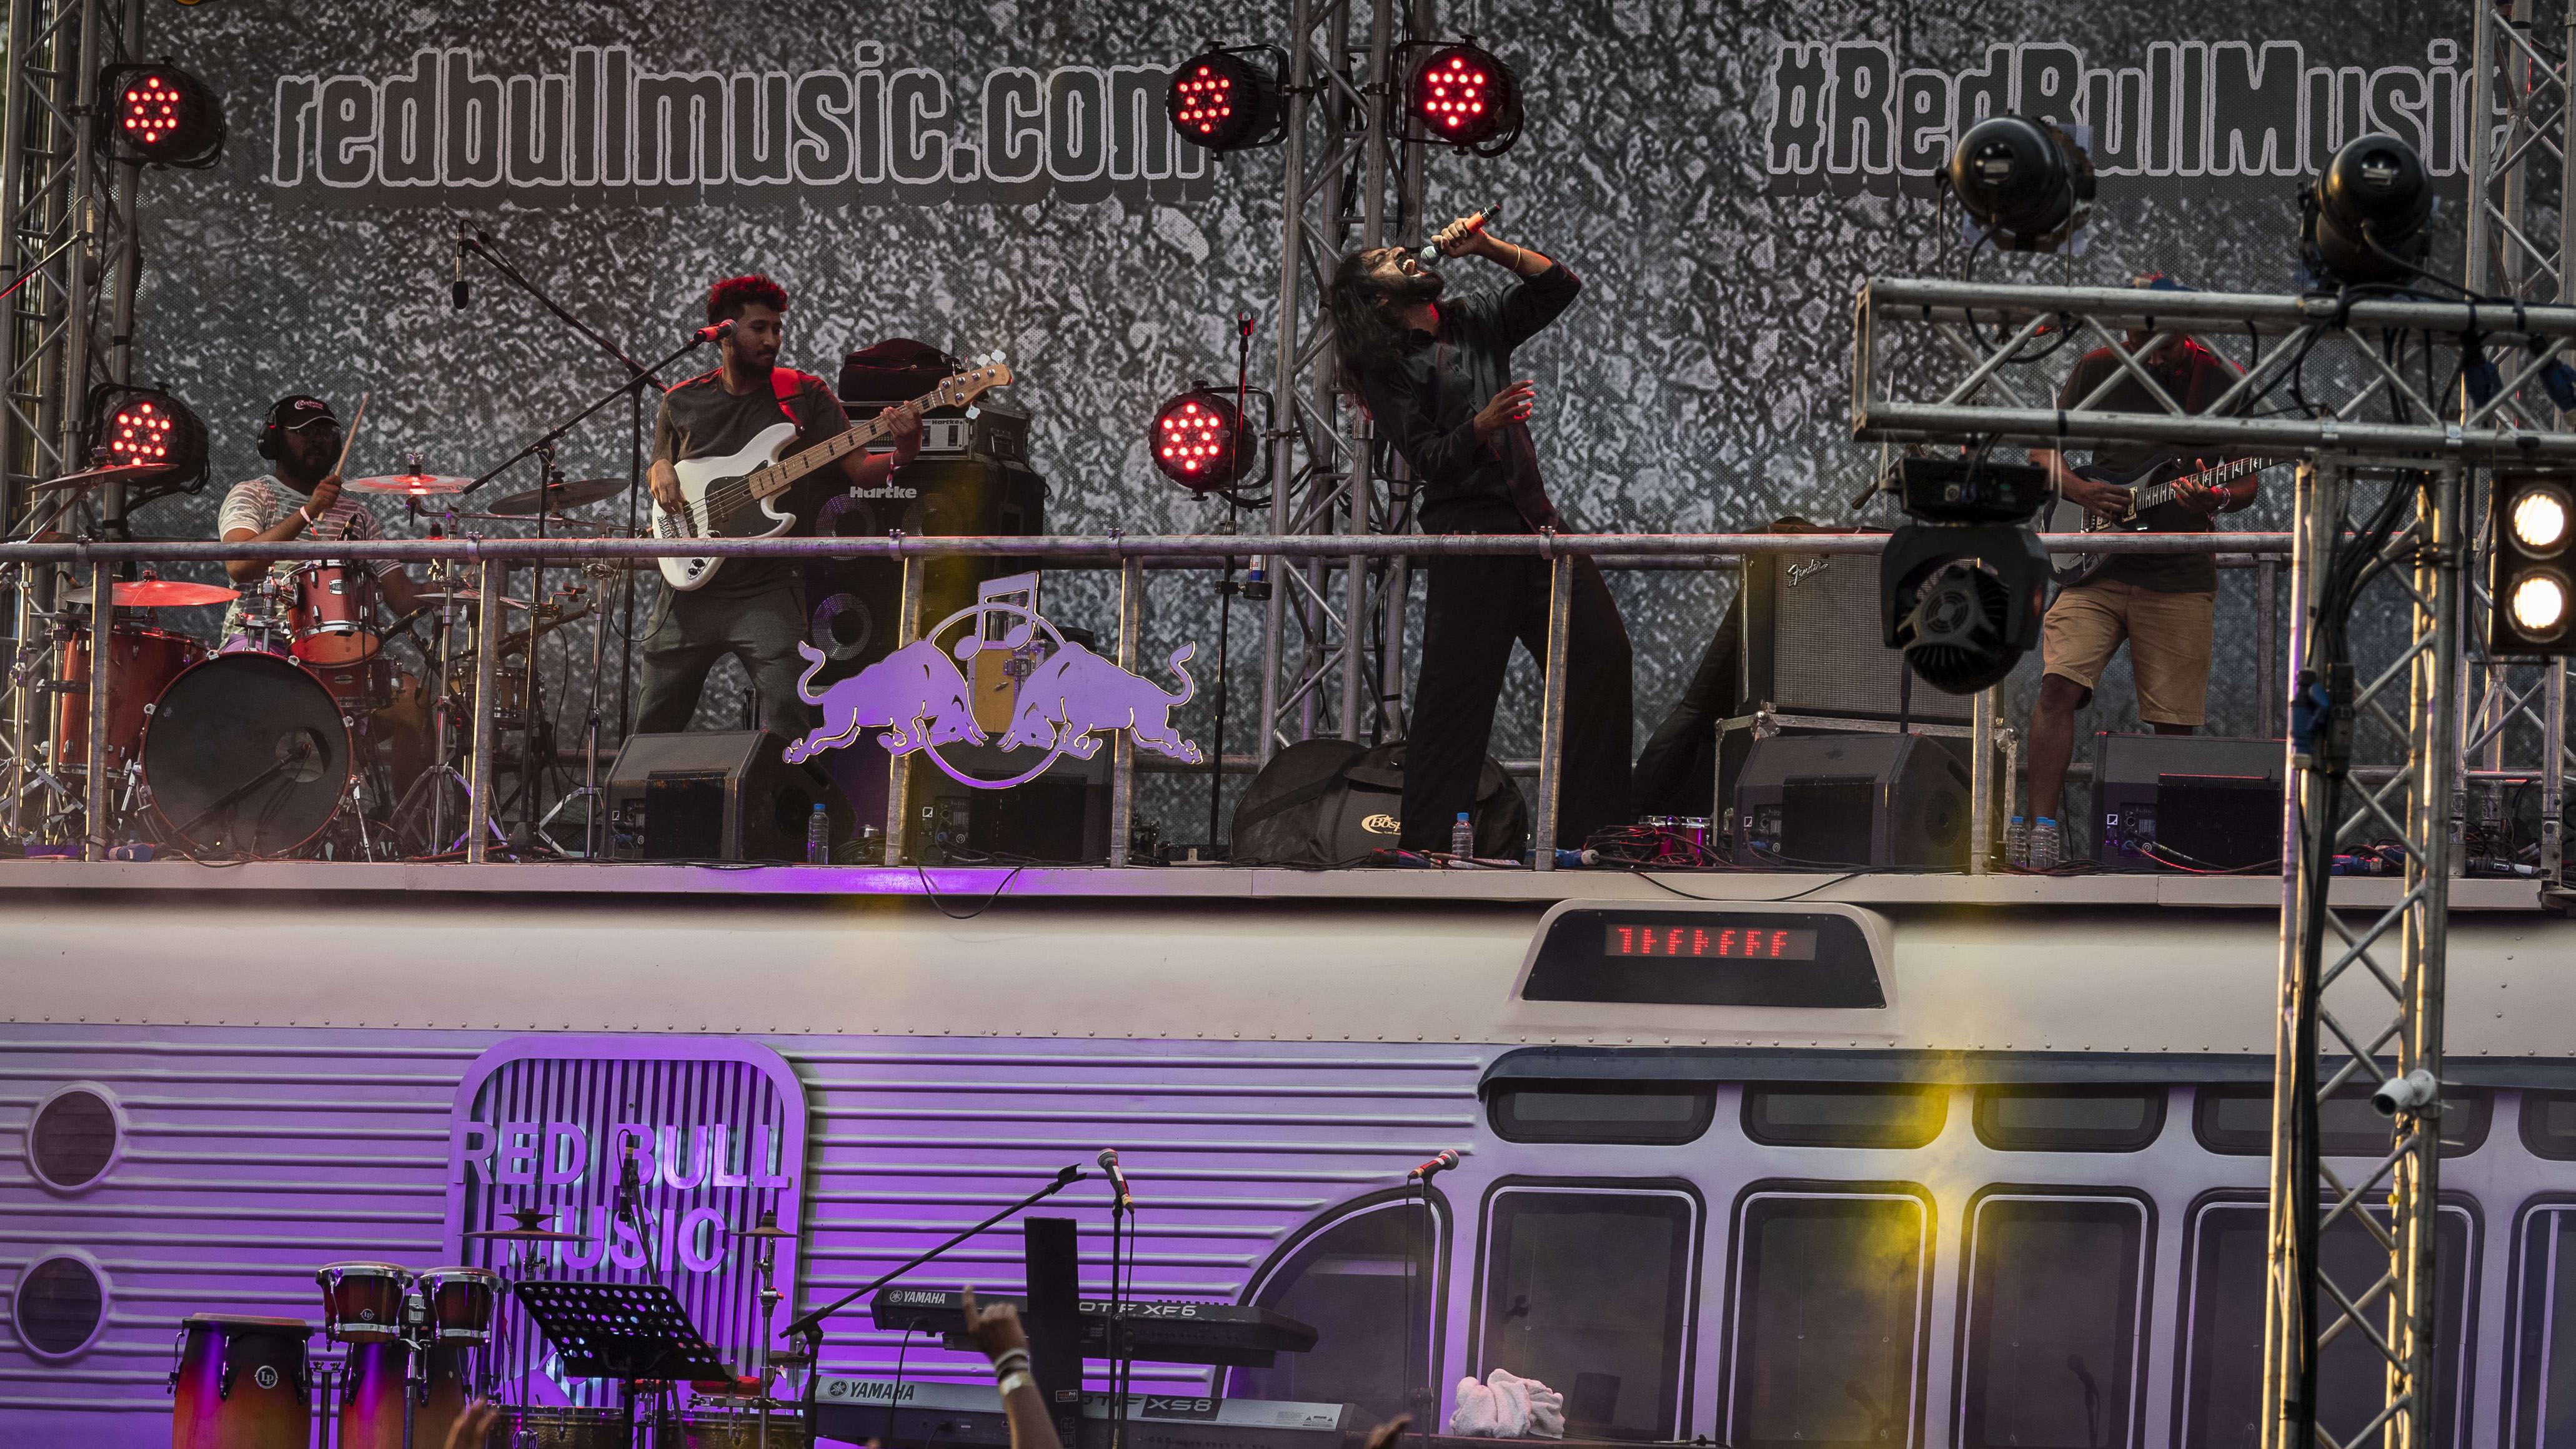 Red Bull Music Presents Benny Dayal, Thaikkudam Bridge and Thakara at Ma...